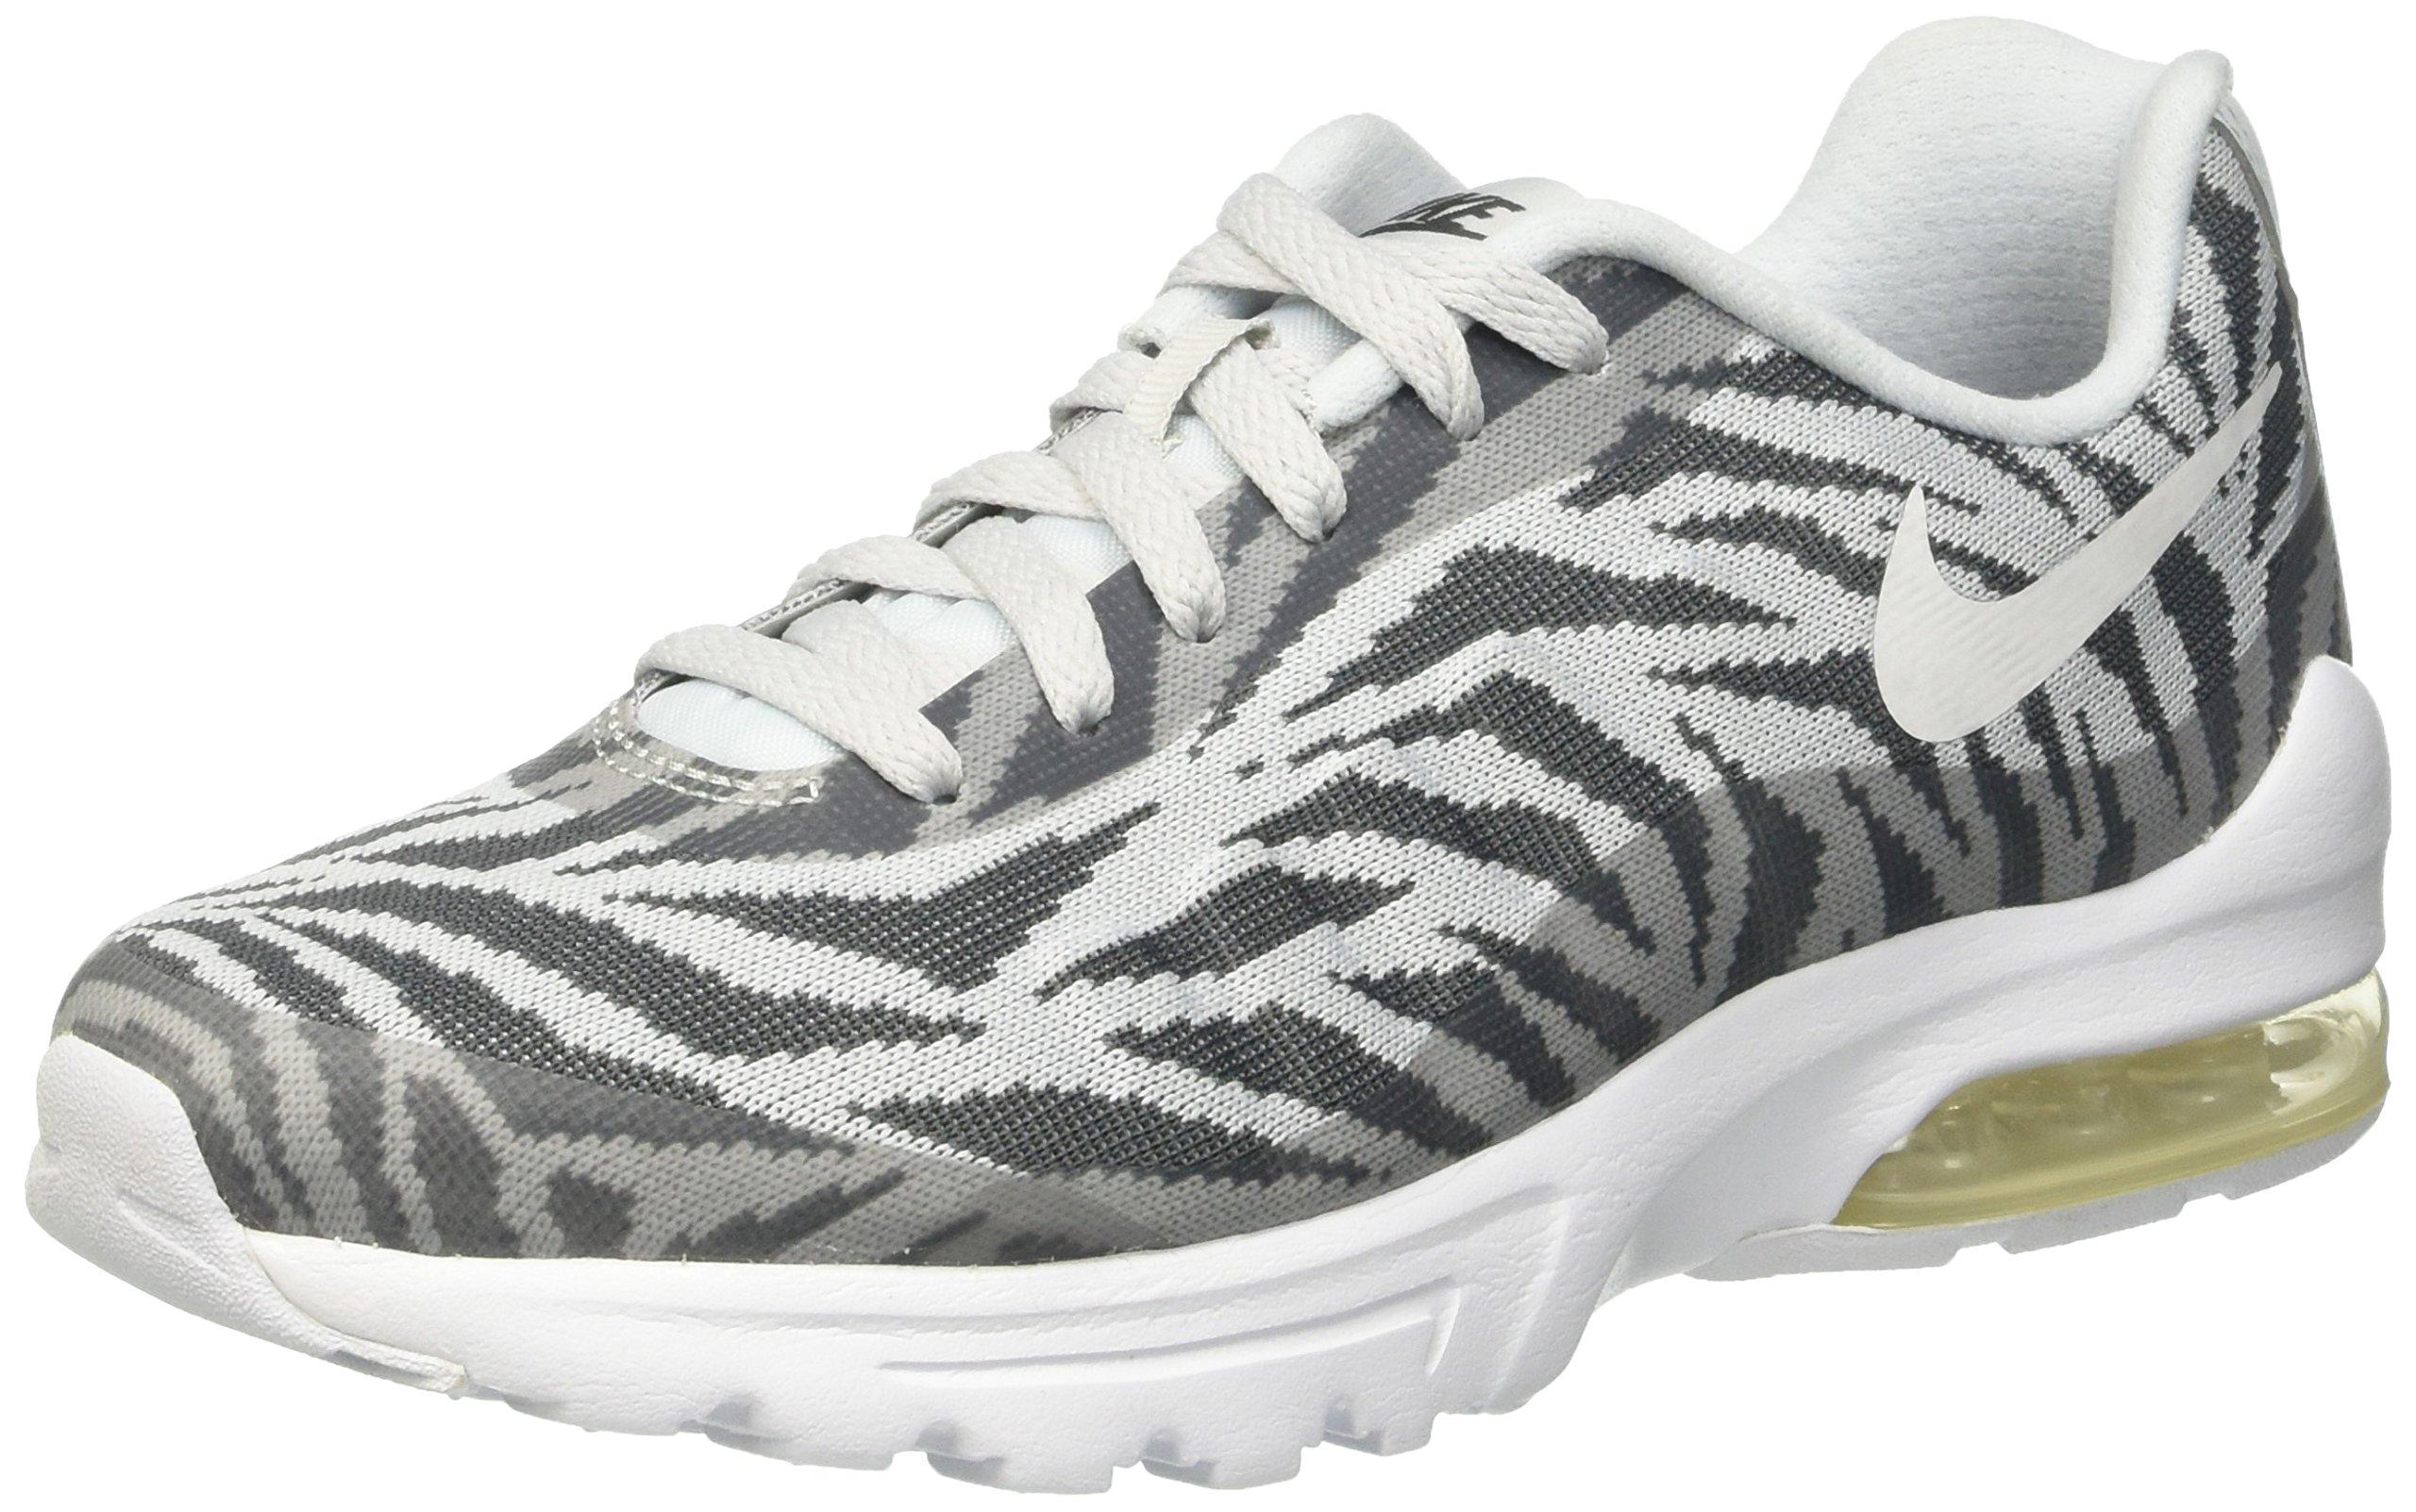 W dark Invigor Grey39 white Course Nike Eu Platinum FemmeMulticolorepure Max Air De KjcrdEntraînement FJT13lKc